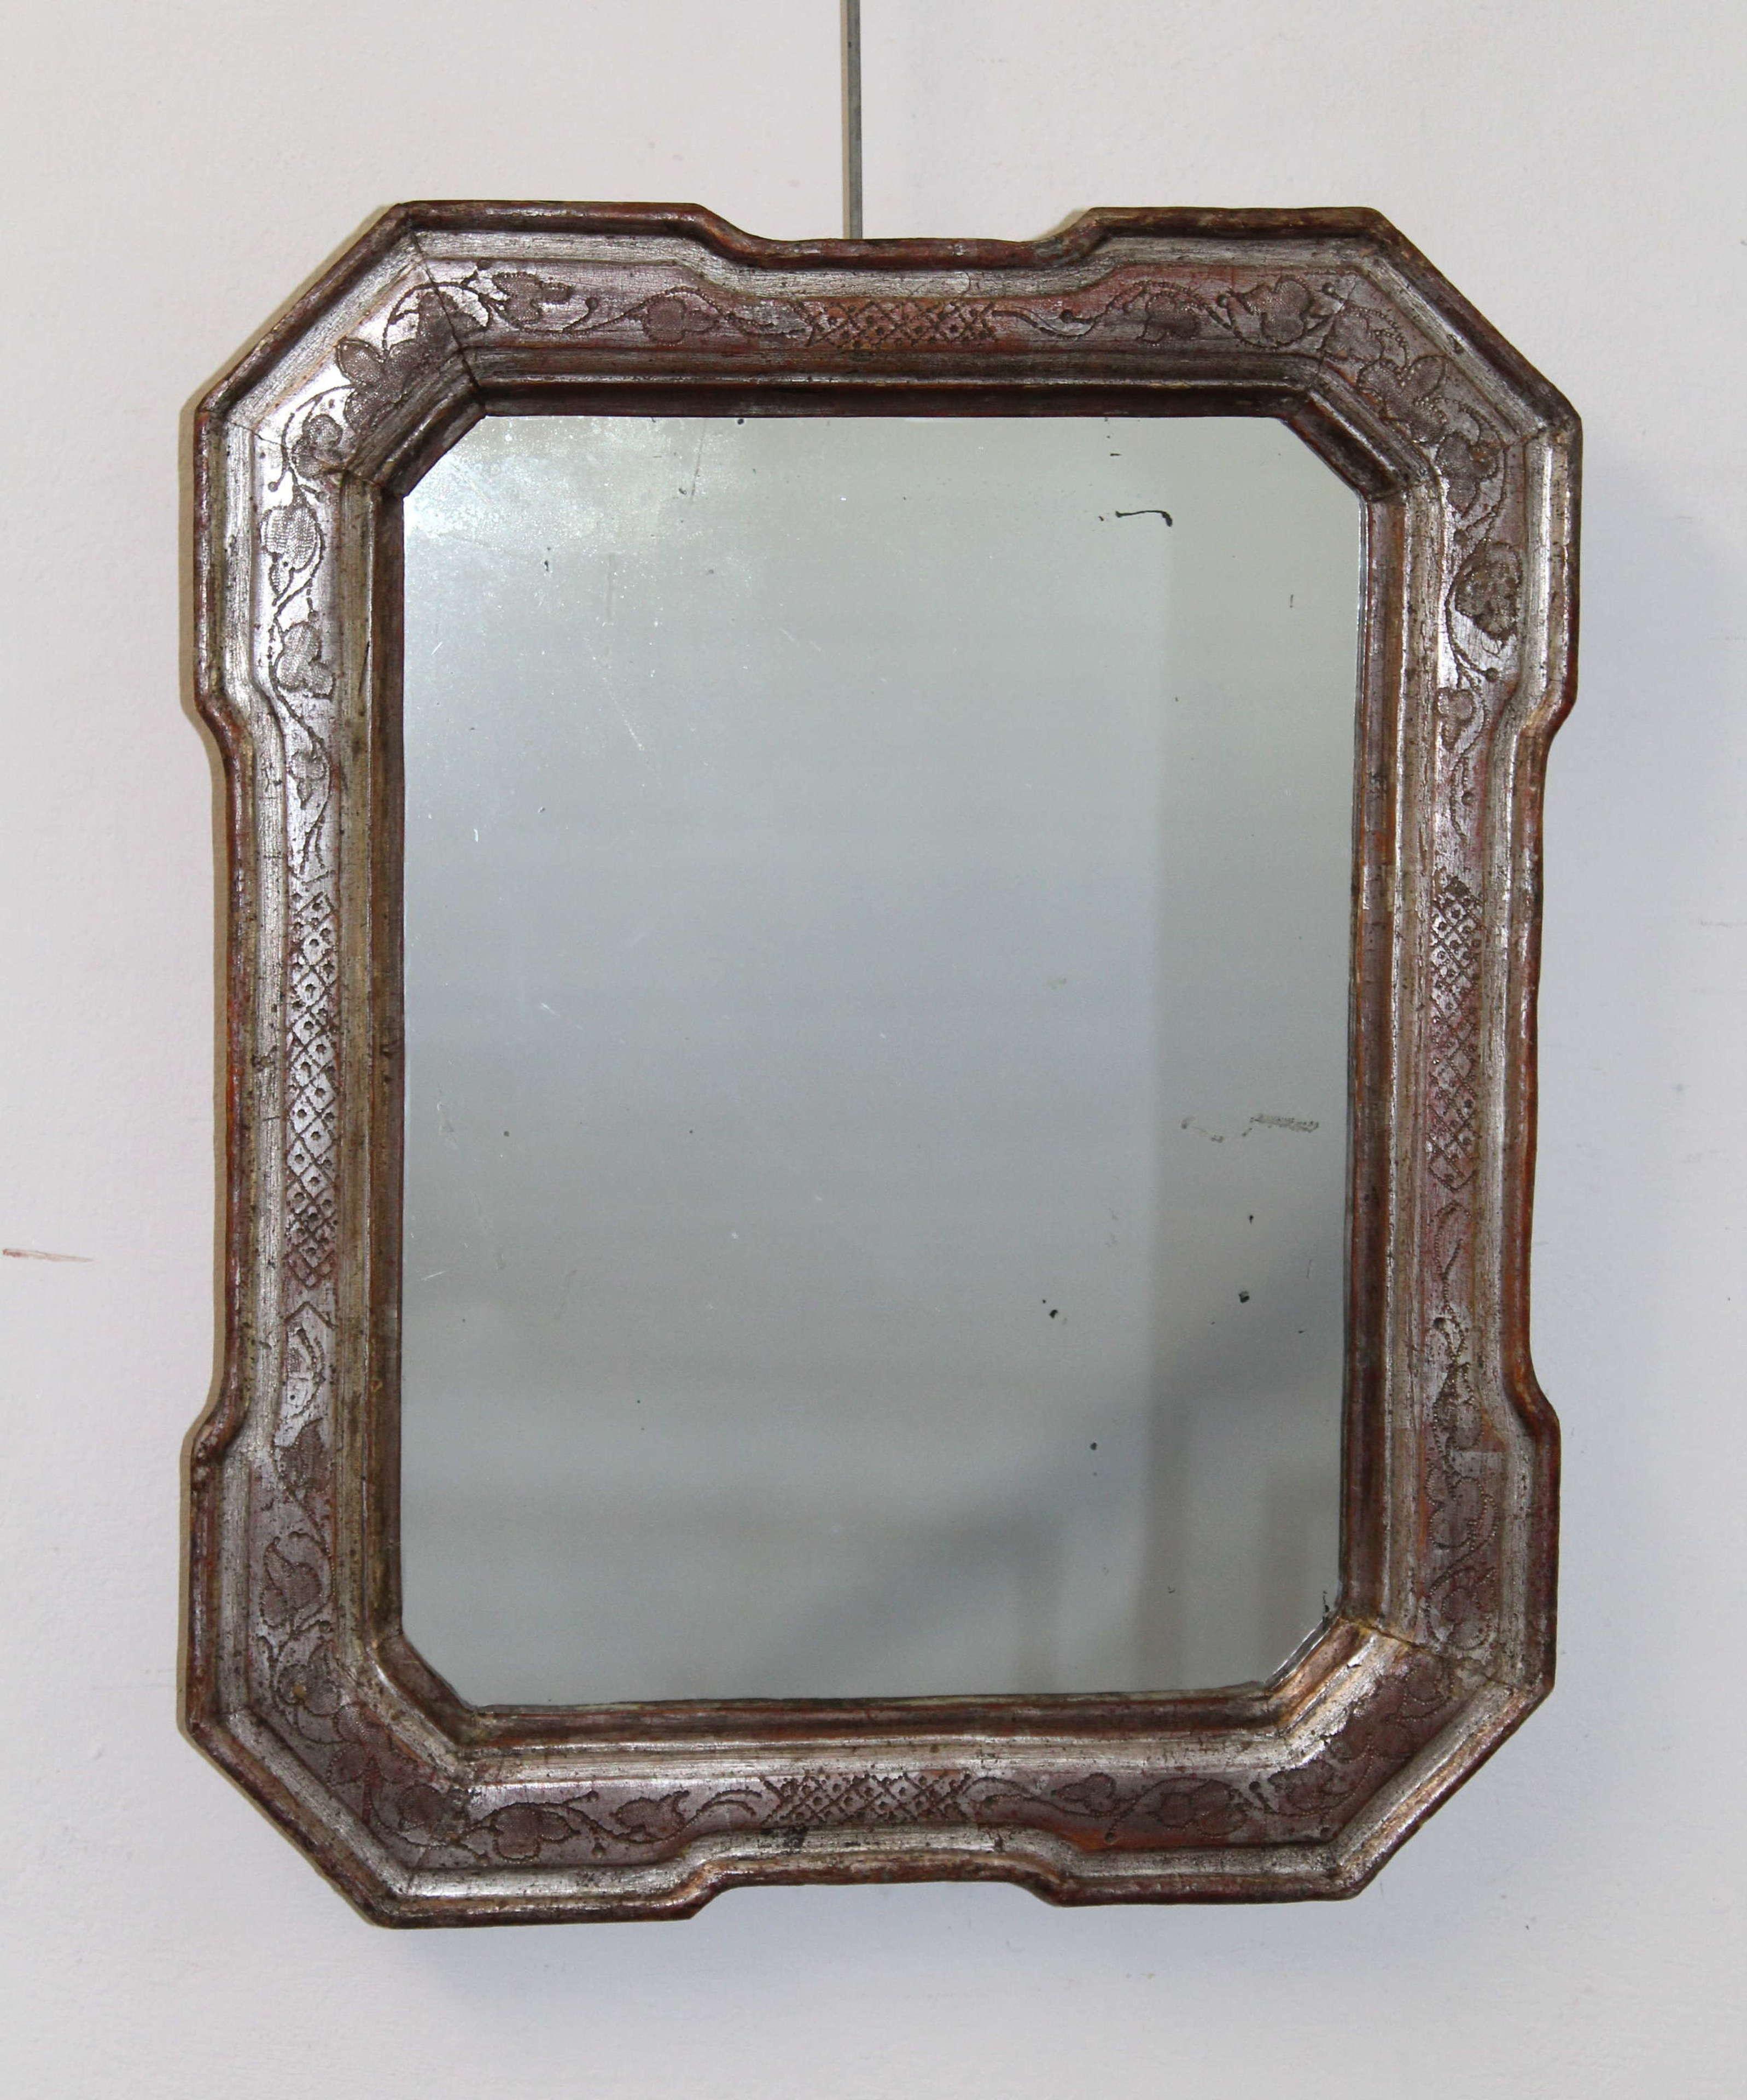 Small antique silverleafed Italian mirror